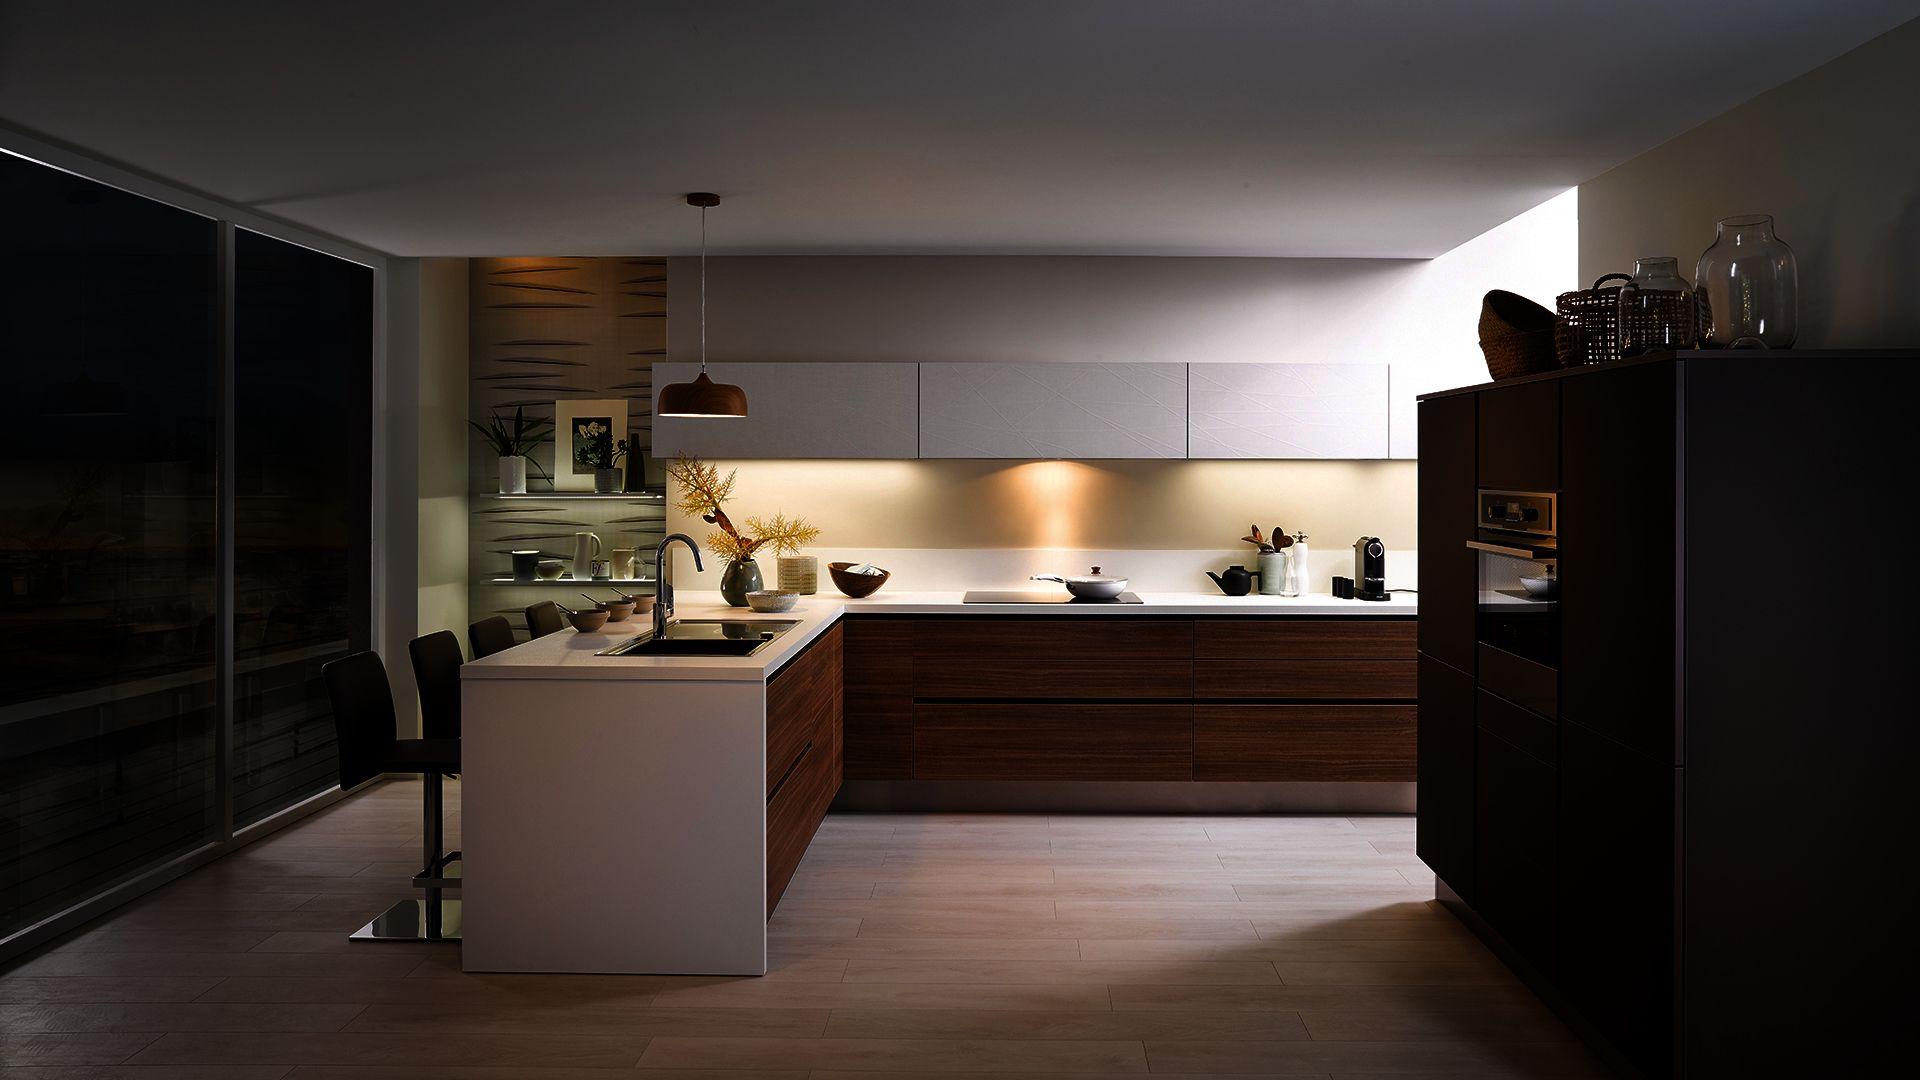 Cuisine Equipee E Label Style Design Bois Cuisinella Cuisine Cuisinella Cuisinella Cuisine Moderne